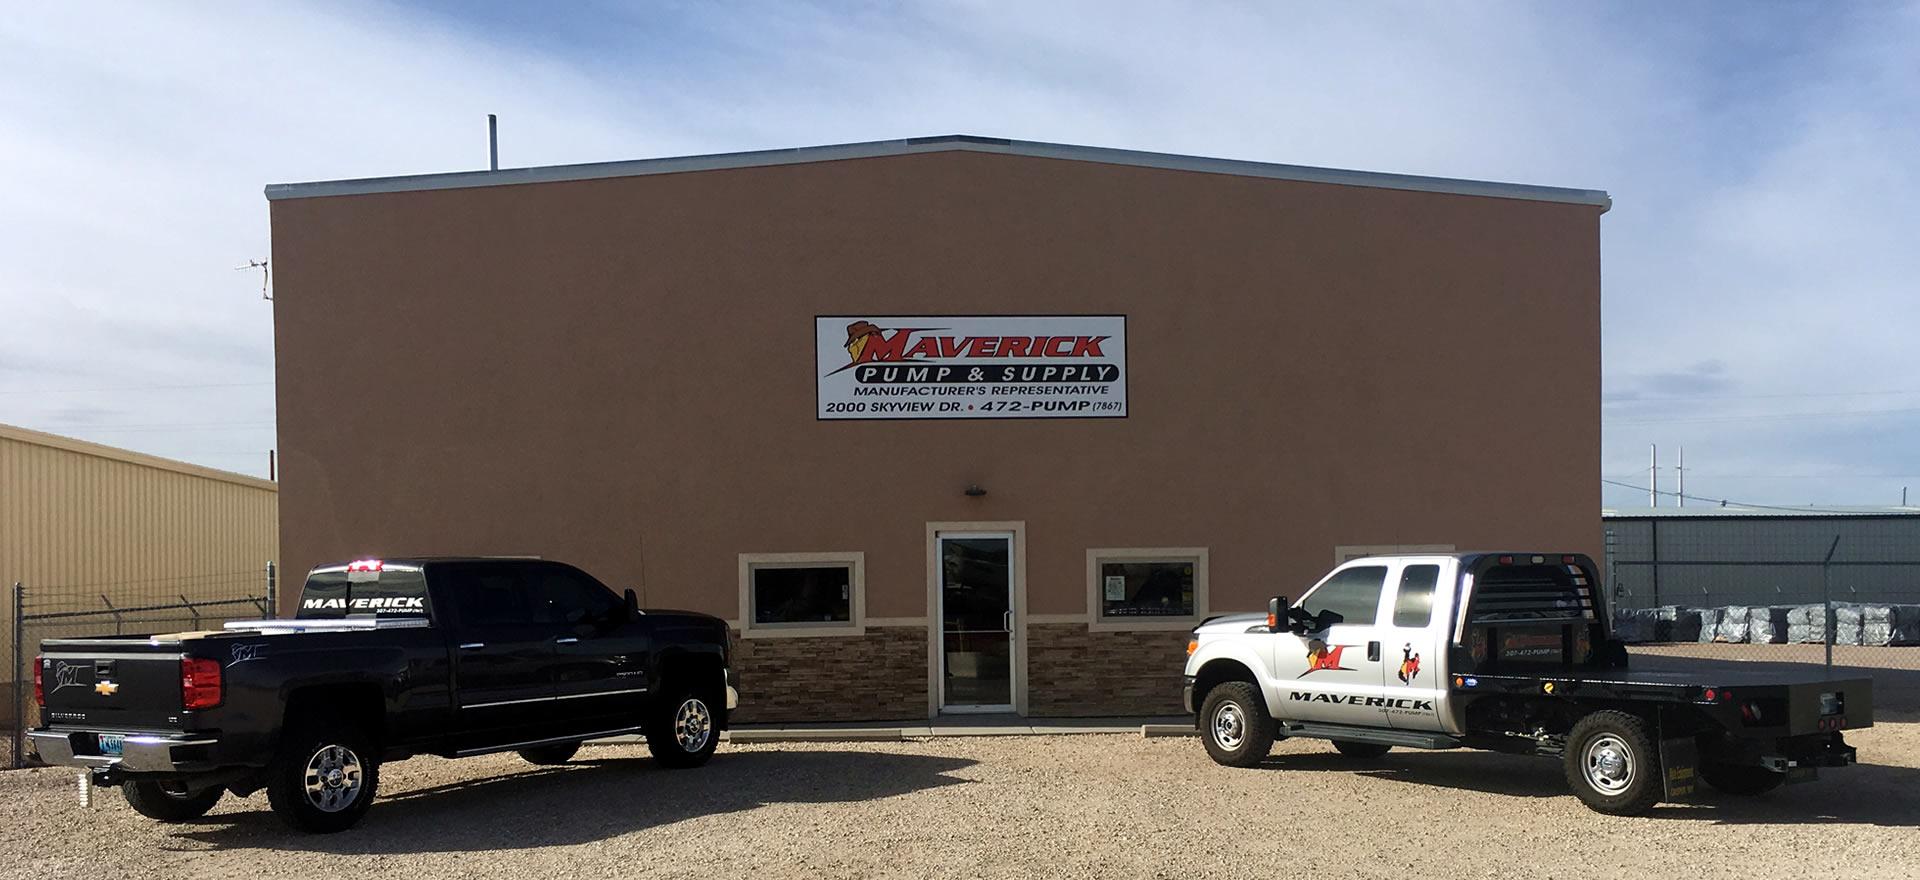 Maverick Pump & Supply - Home